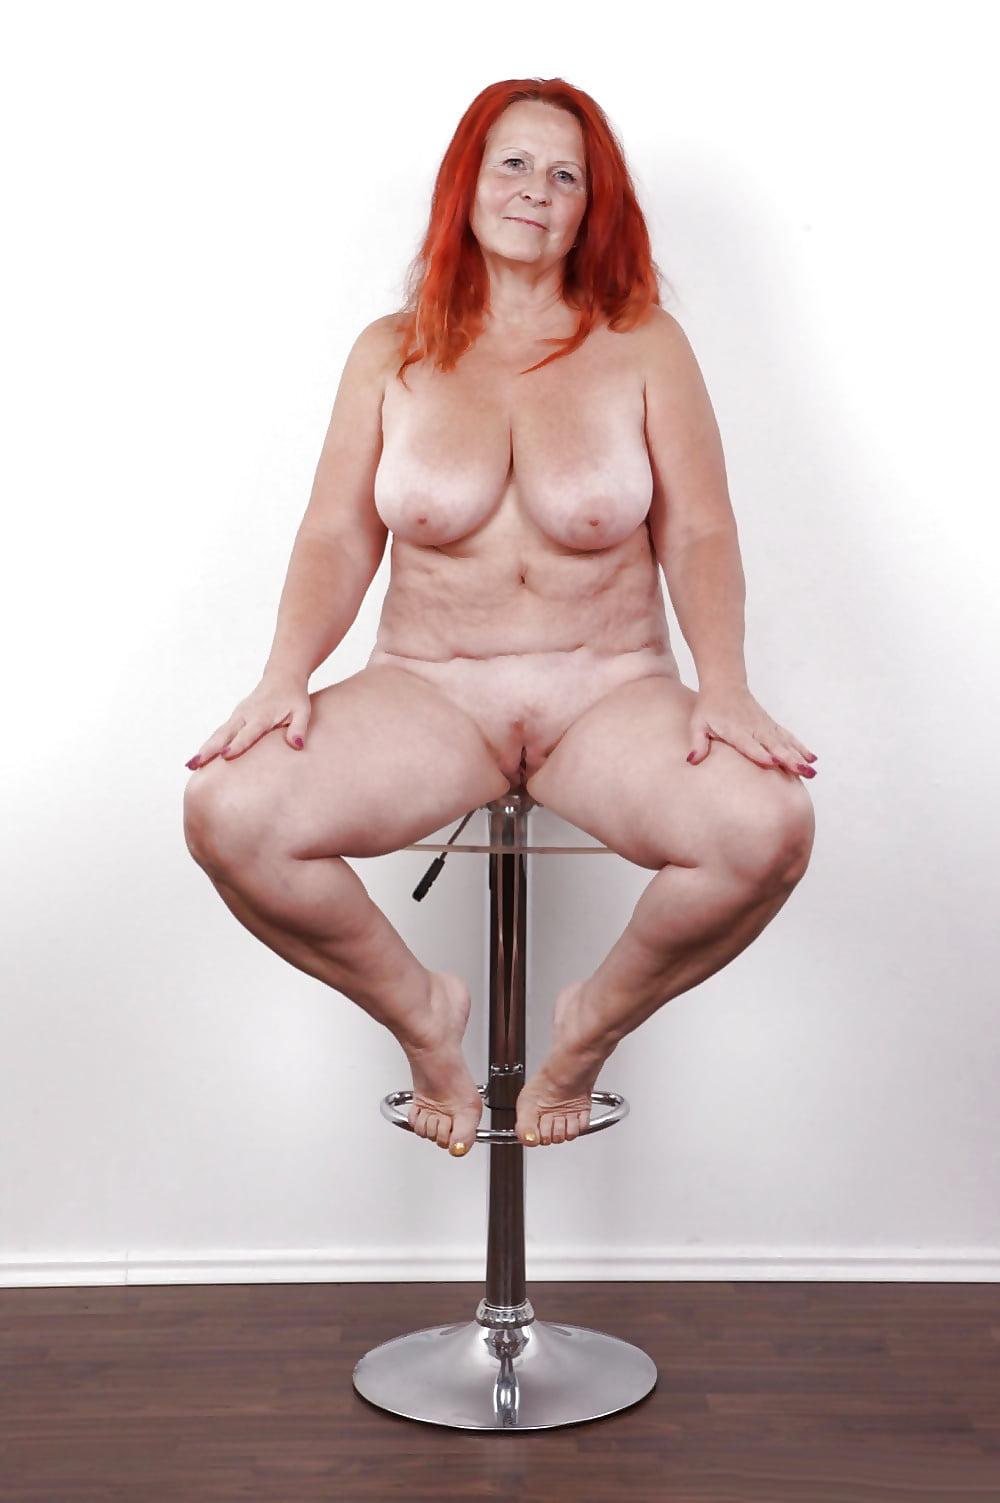 Naked photo porn mature casting nude pregnant kerala